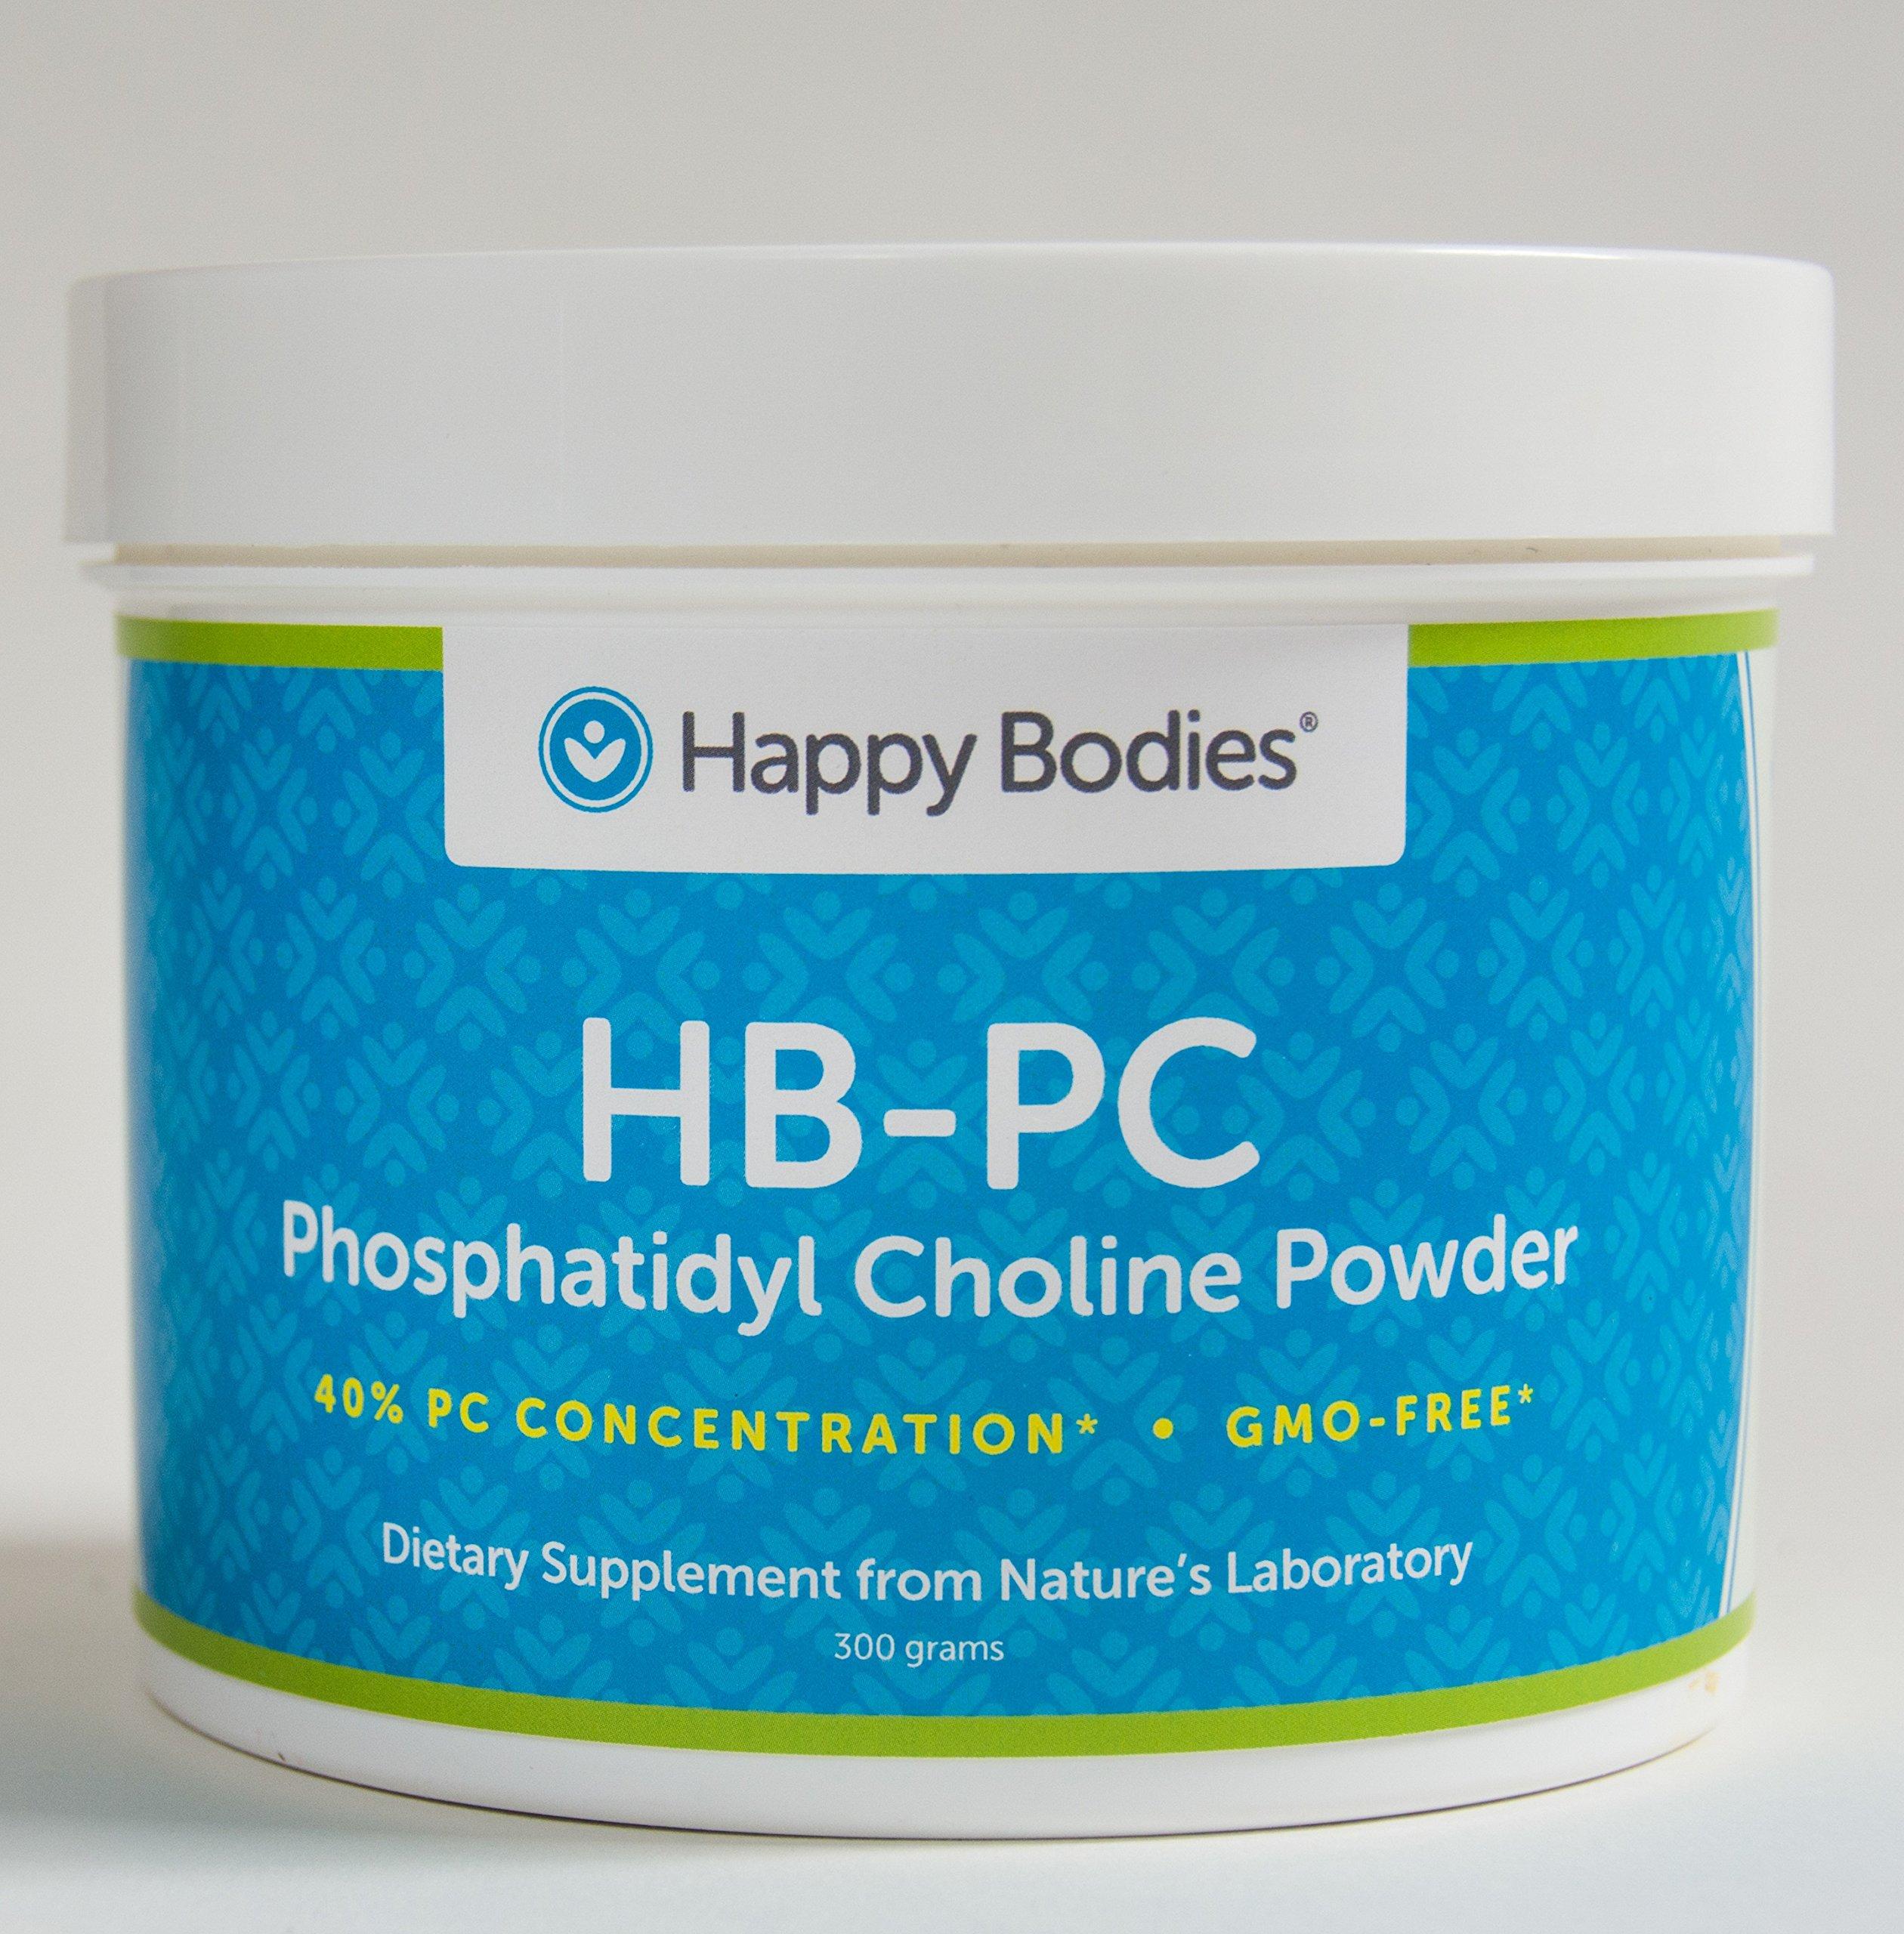 HB-PC Phosphatidyl Choline-40%, 300 g, GMO-FREE Powder (HBPC) Happy Bodies by Happy Bodies